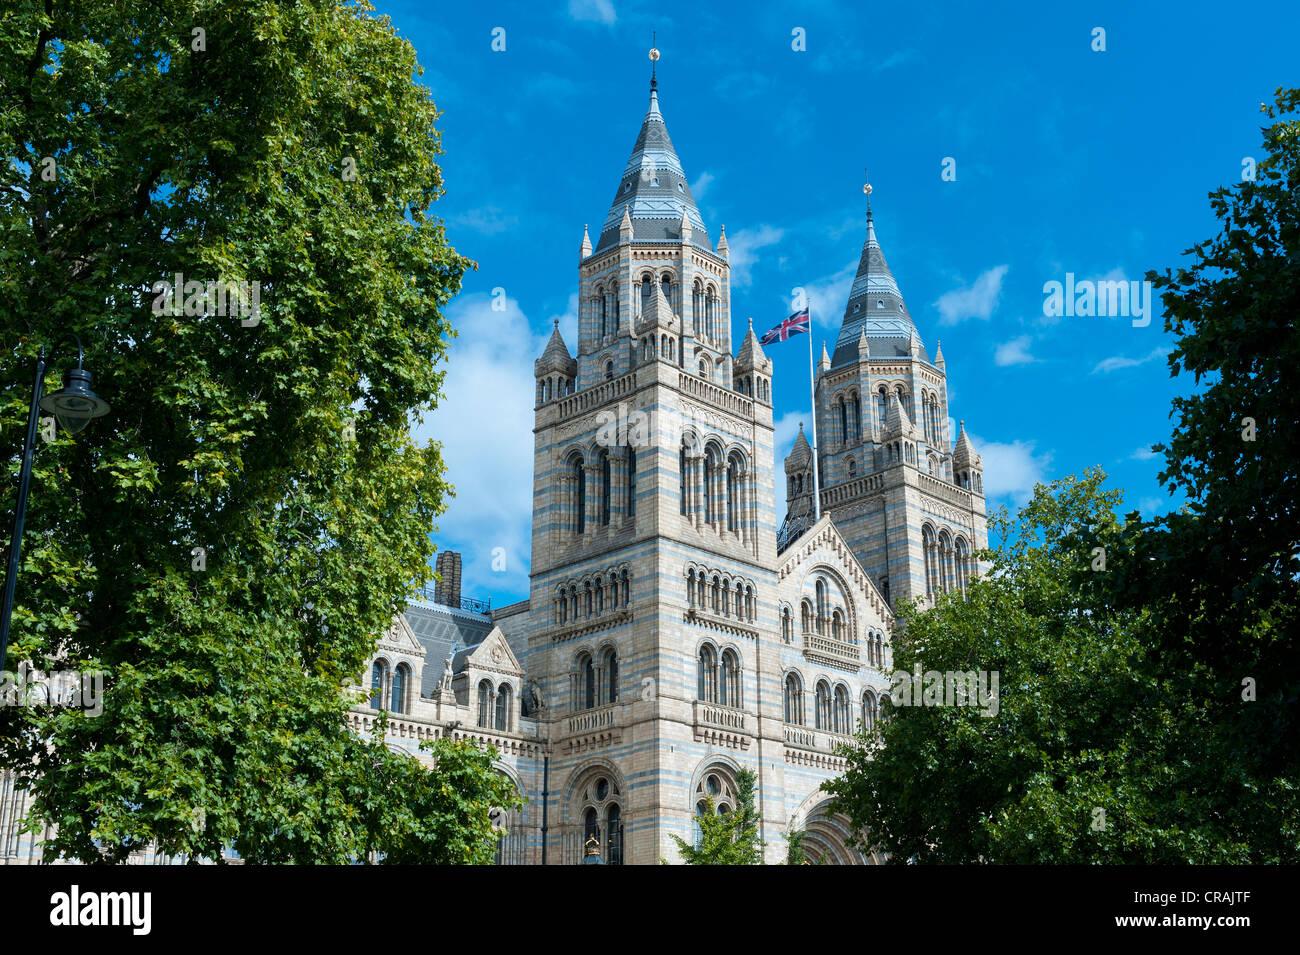 Natural History Museum, London, England, United Kingdom, Europe - Stock Image